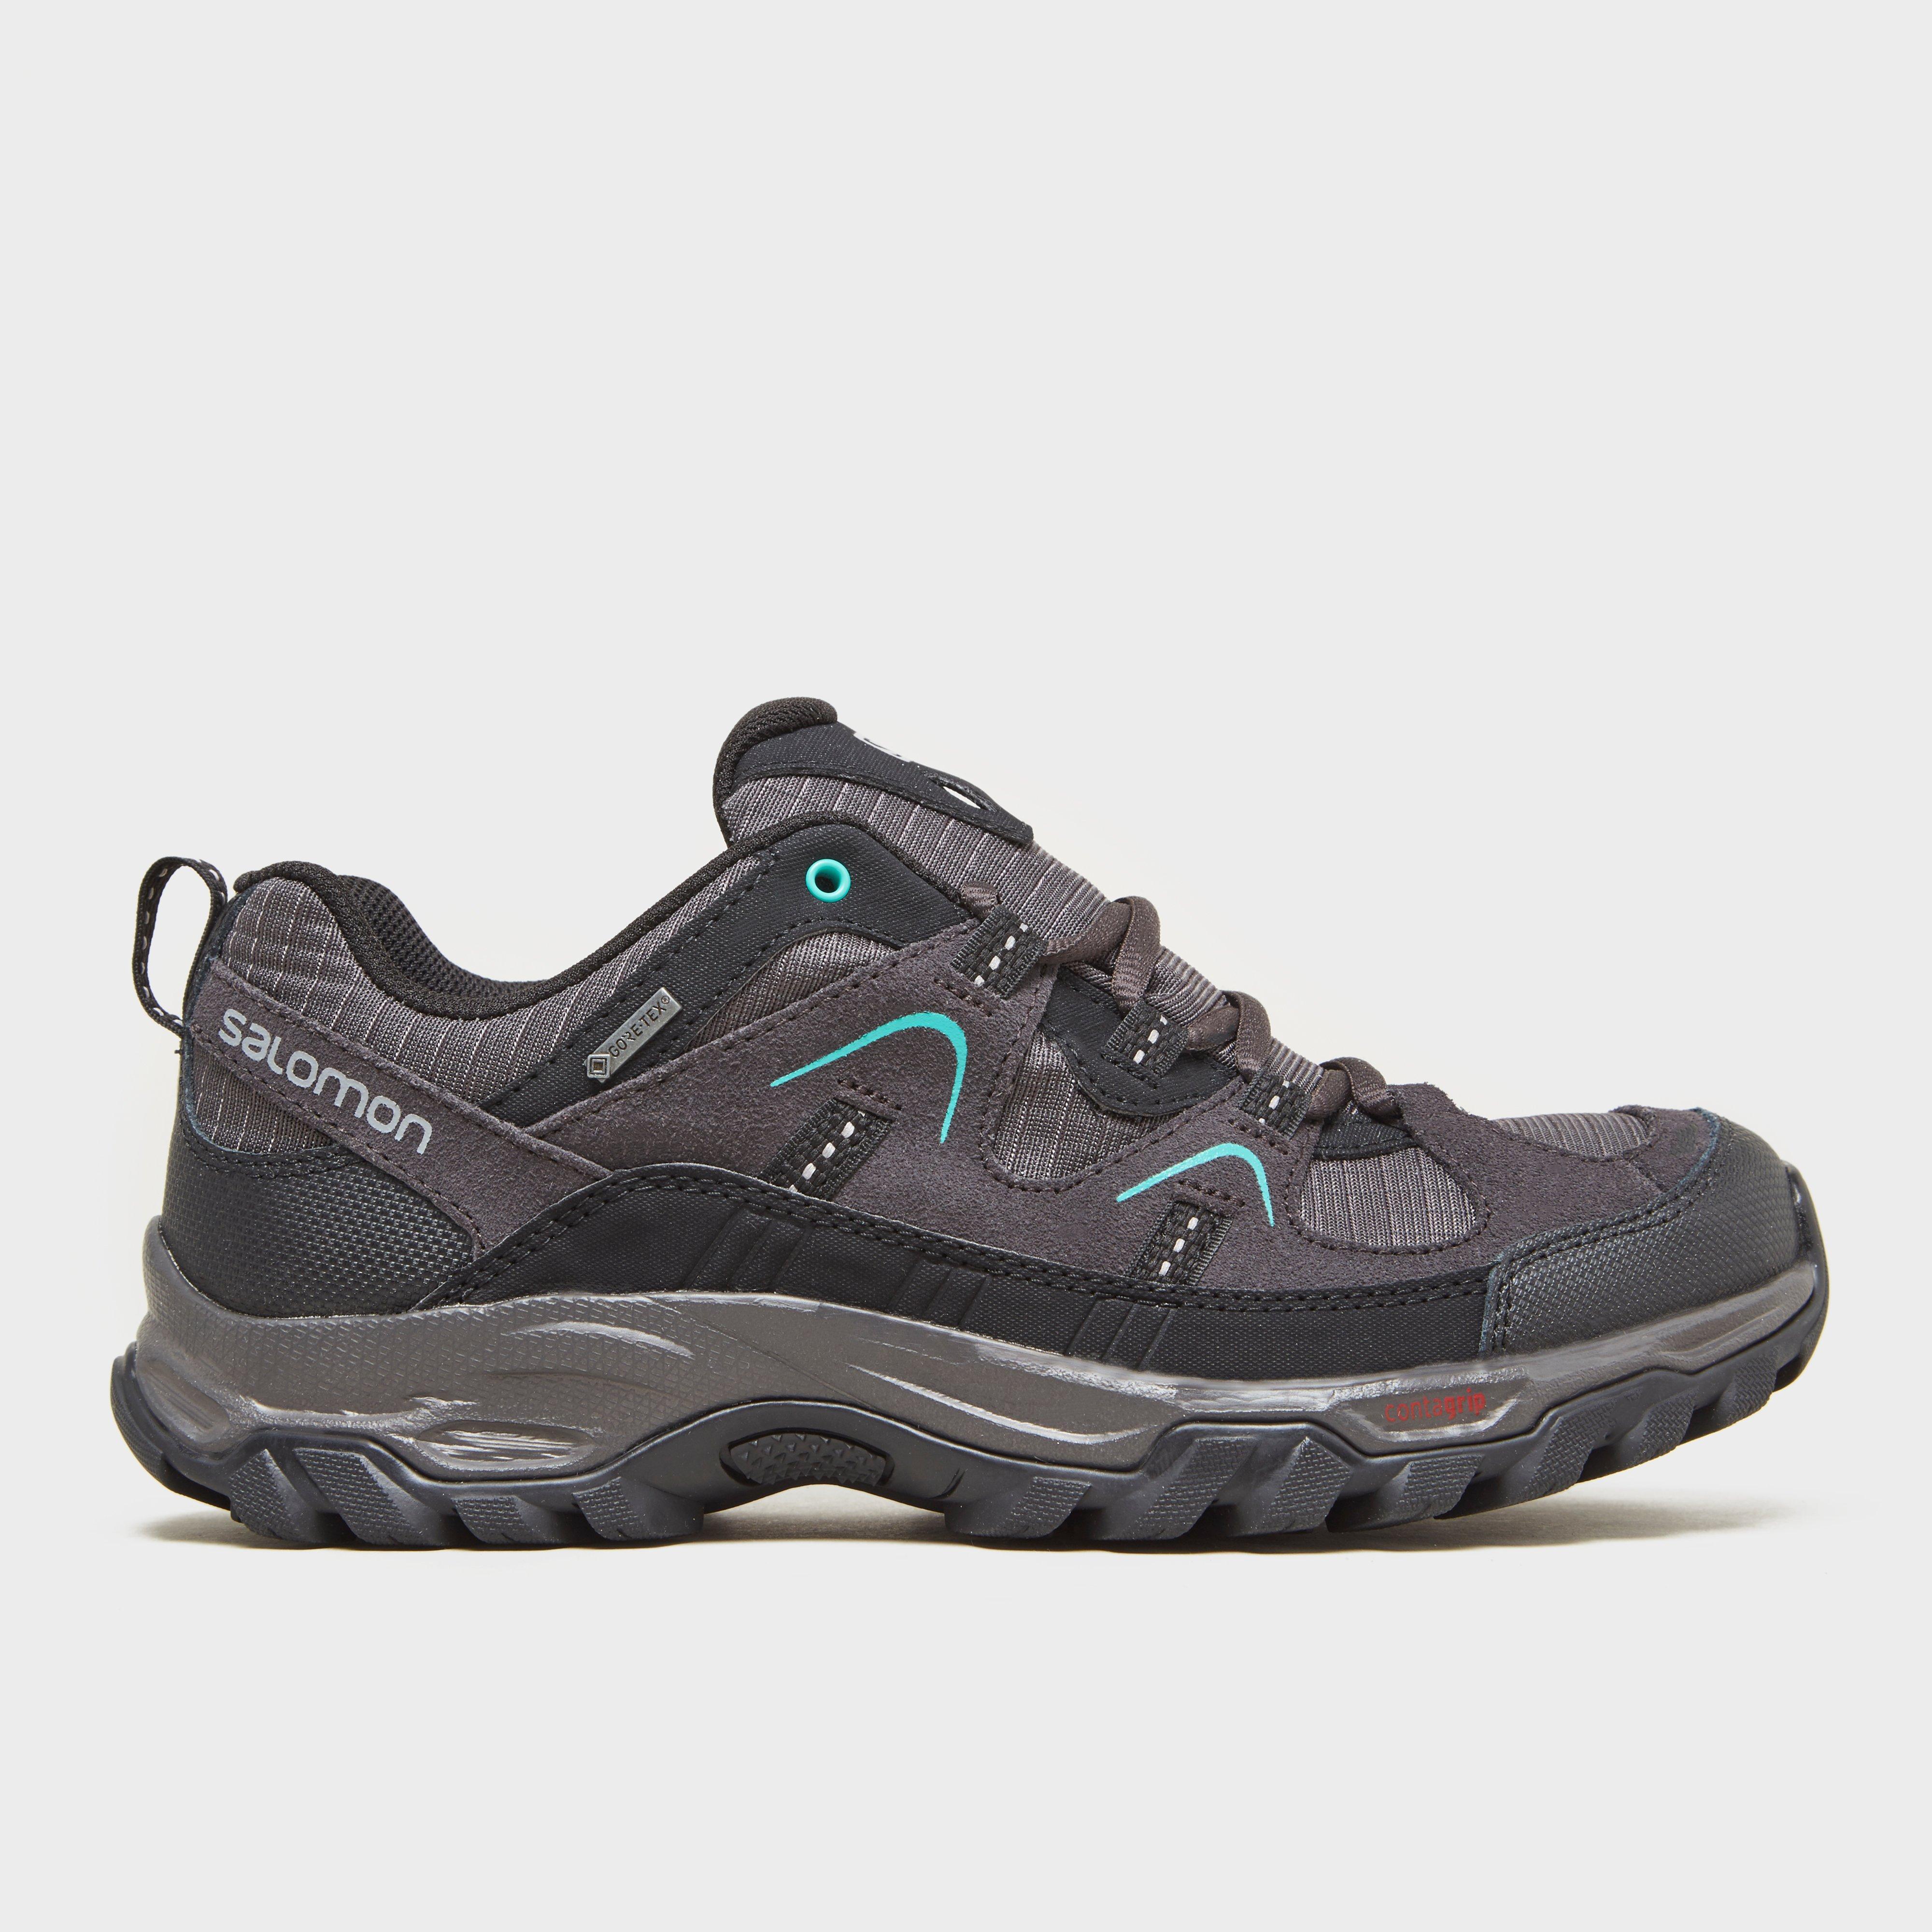 Women S Shoes Comfort Support Similar To Salomon